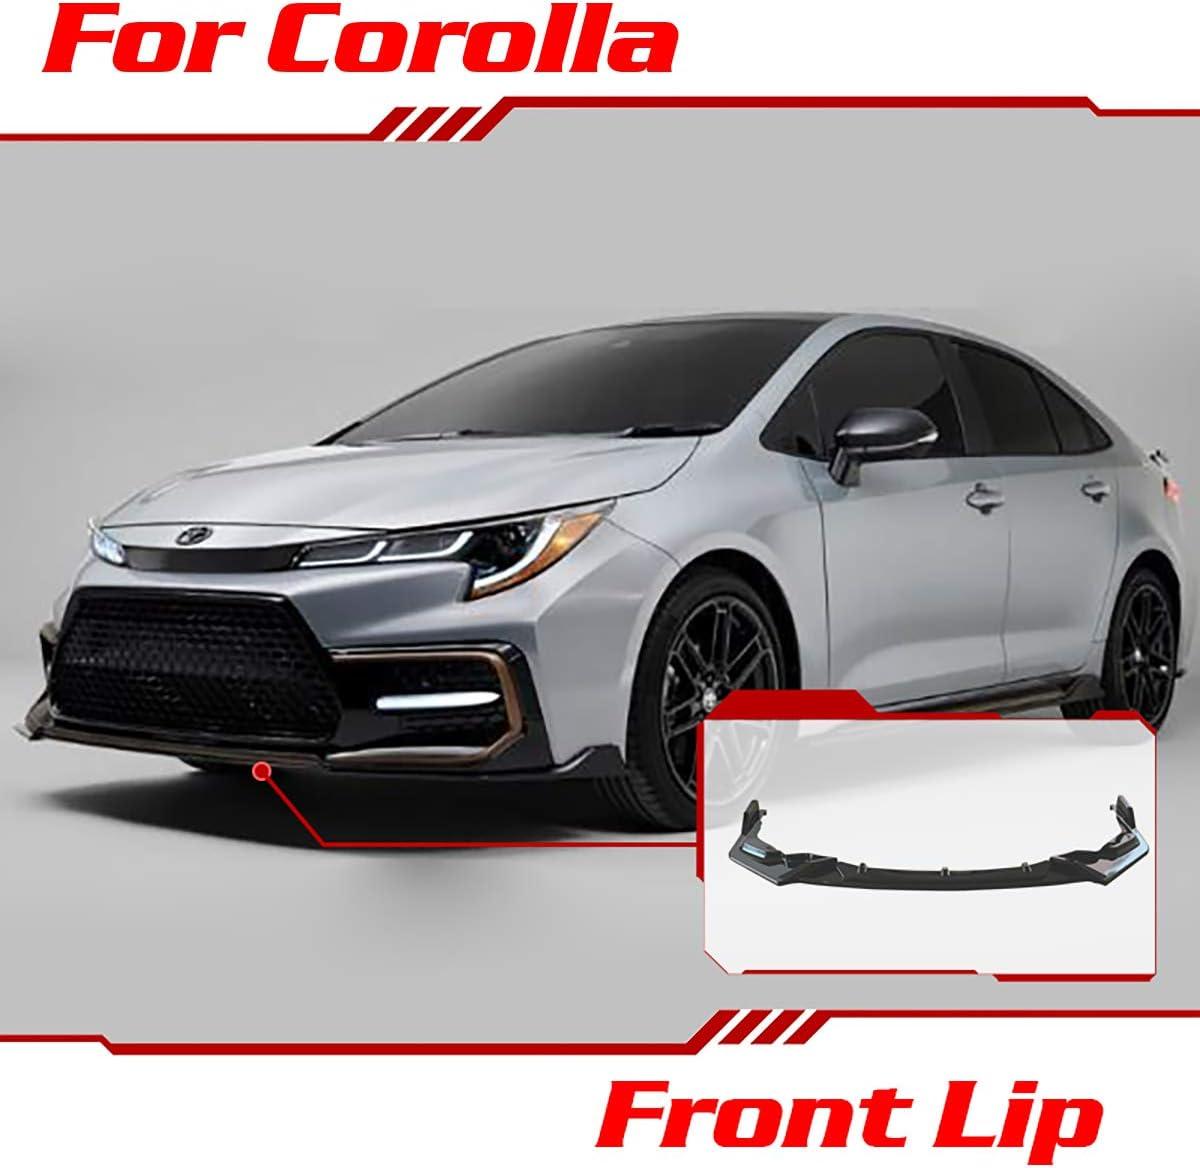 For Toyota Corolla SE XSE 2020-21 Glossy Black Front Bumper Lip Body Spoiler 3PCS